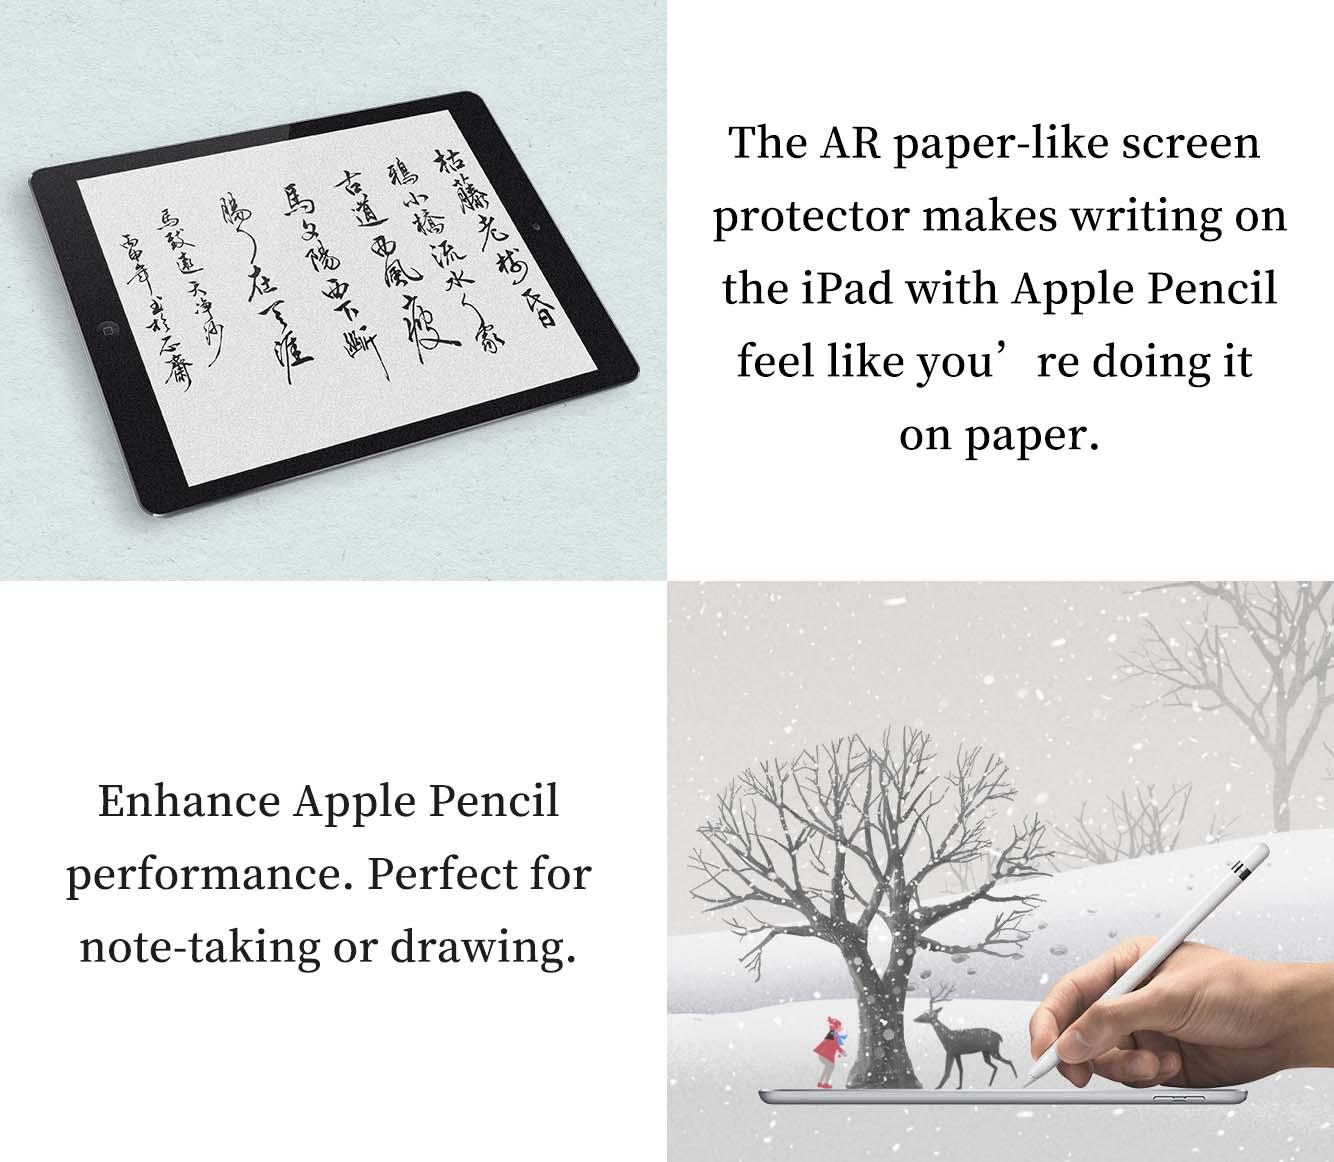 Apple iPad Air 2019 screen protector